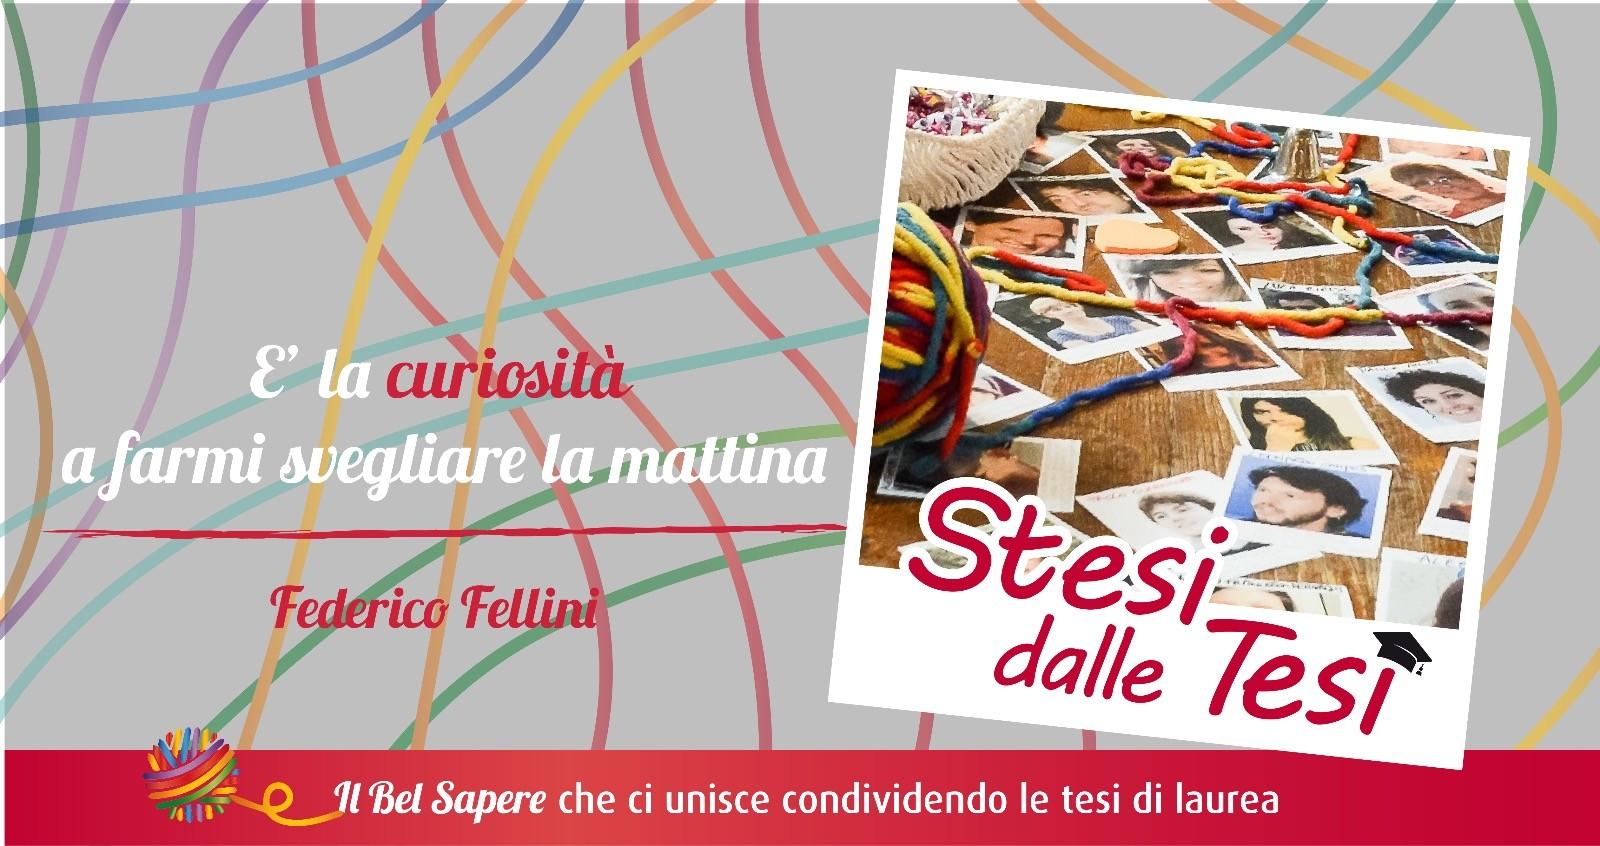 STESI DALLE TESI-Terre Vivaci